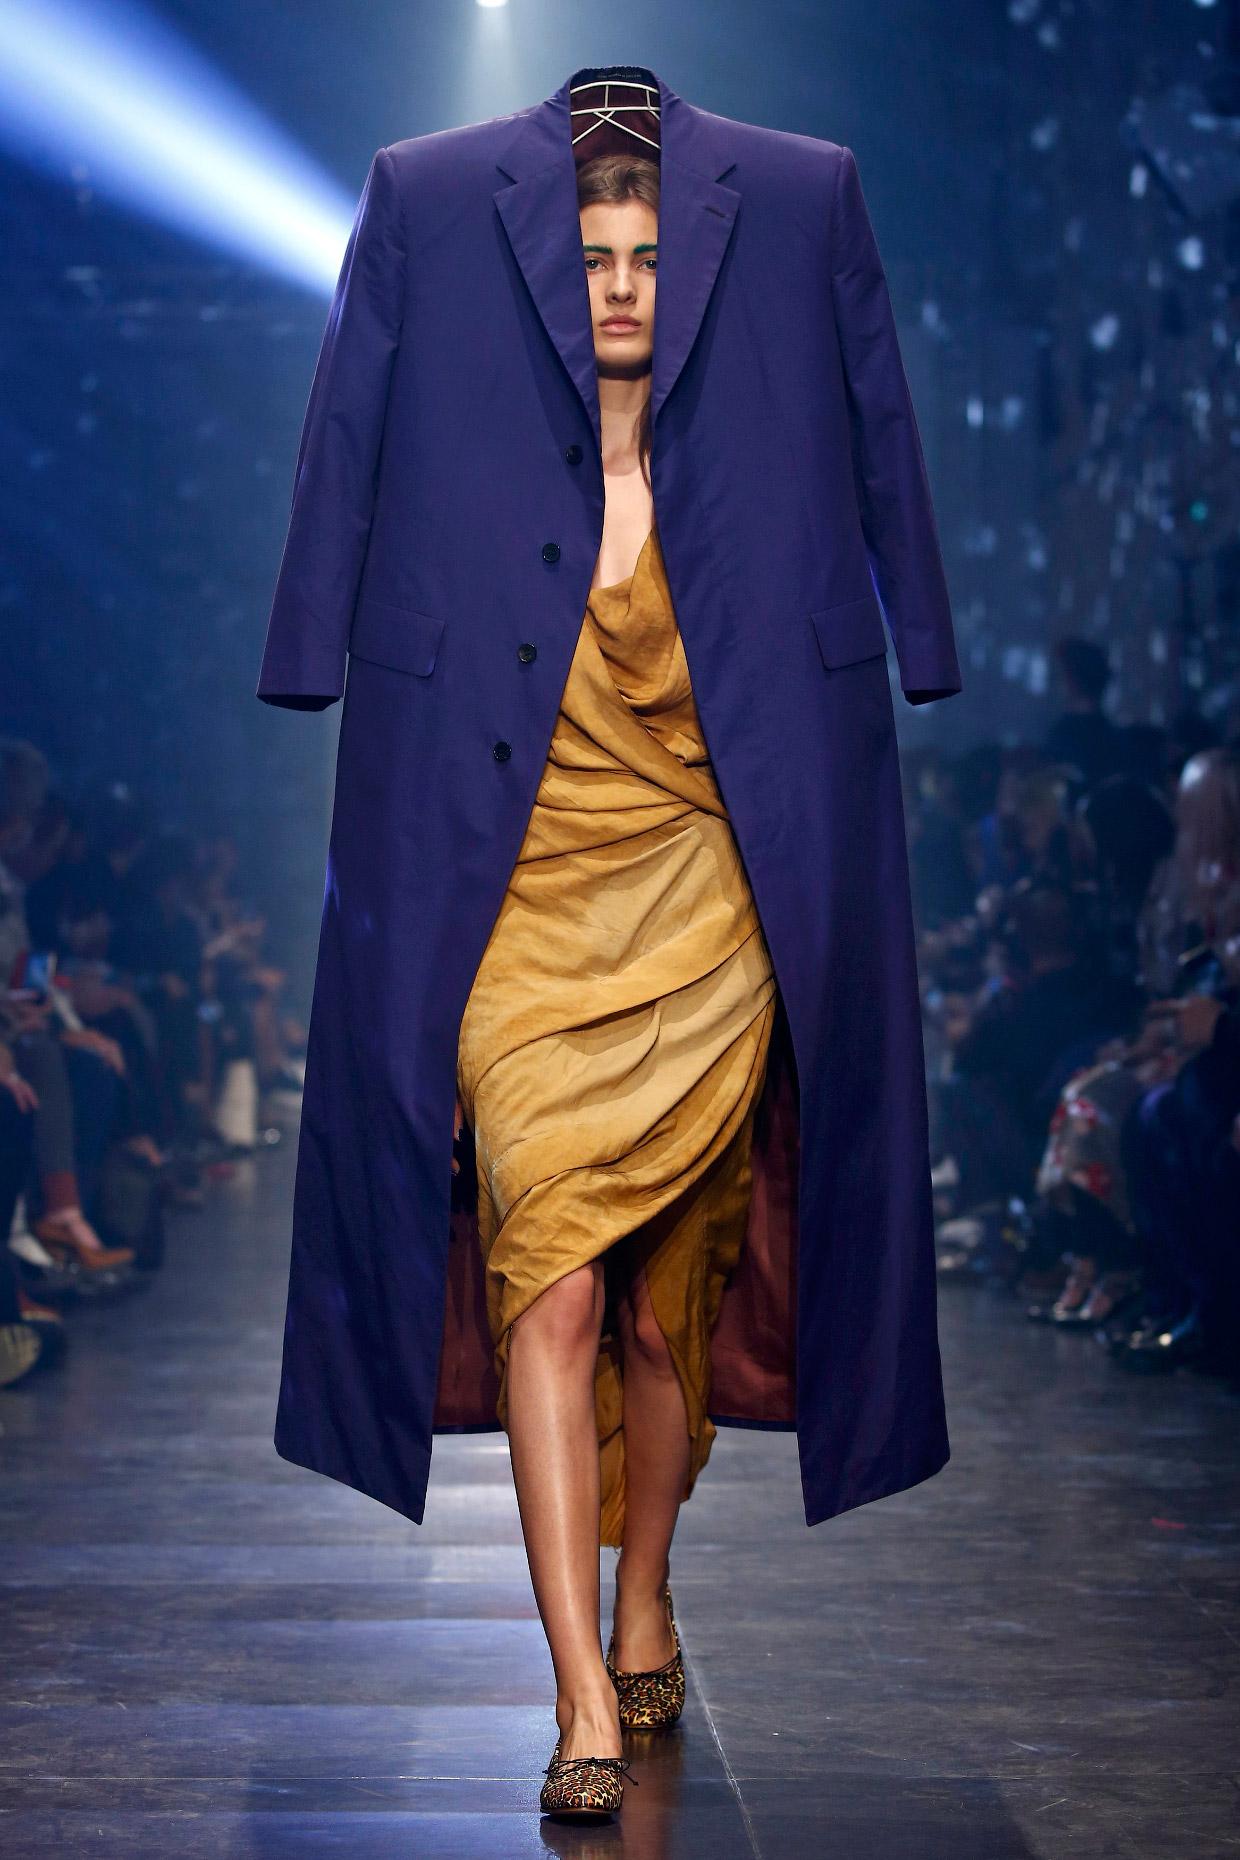 Craze Definition of Craze by Merriam-Webster Fashion a craze world over